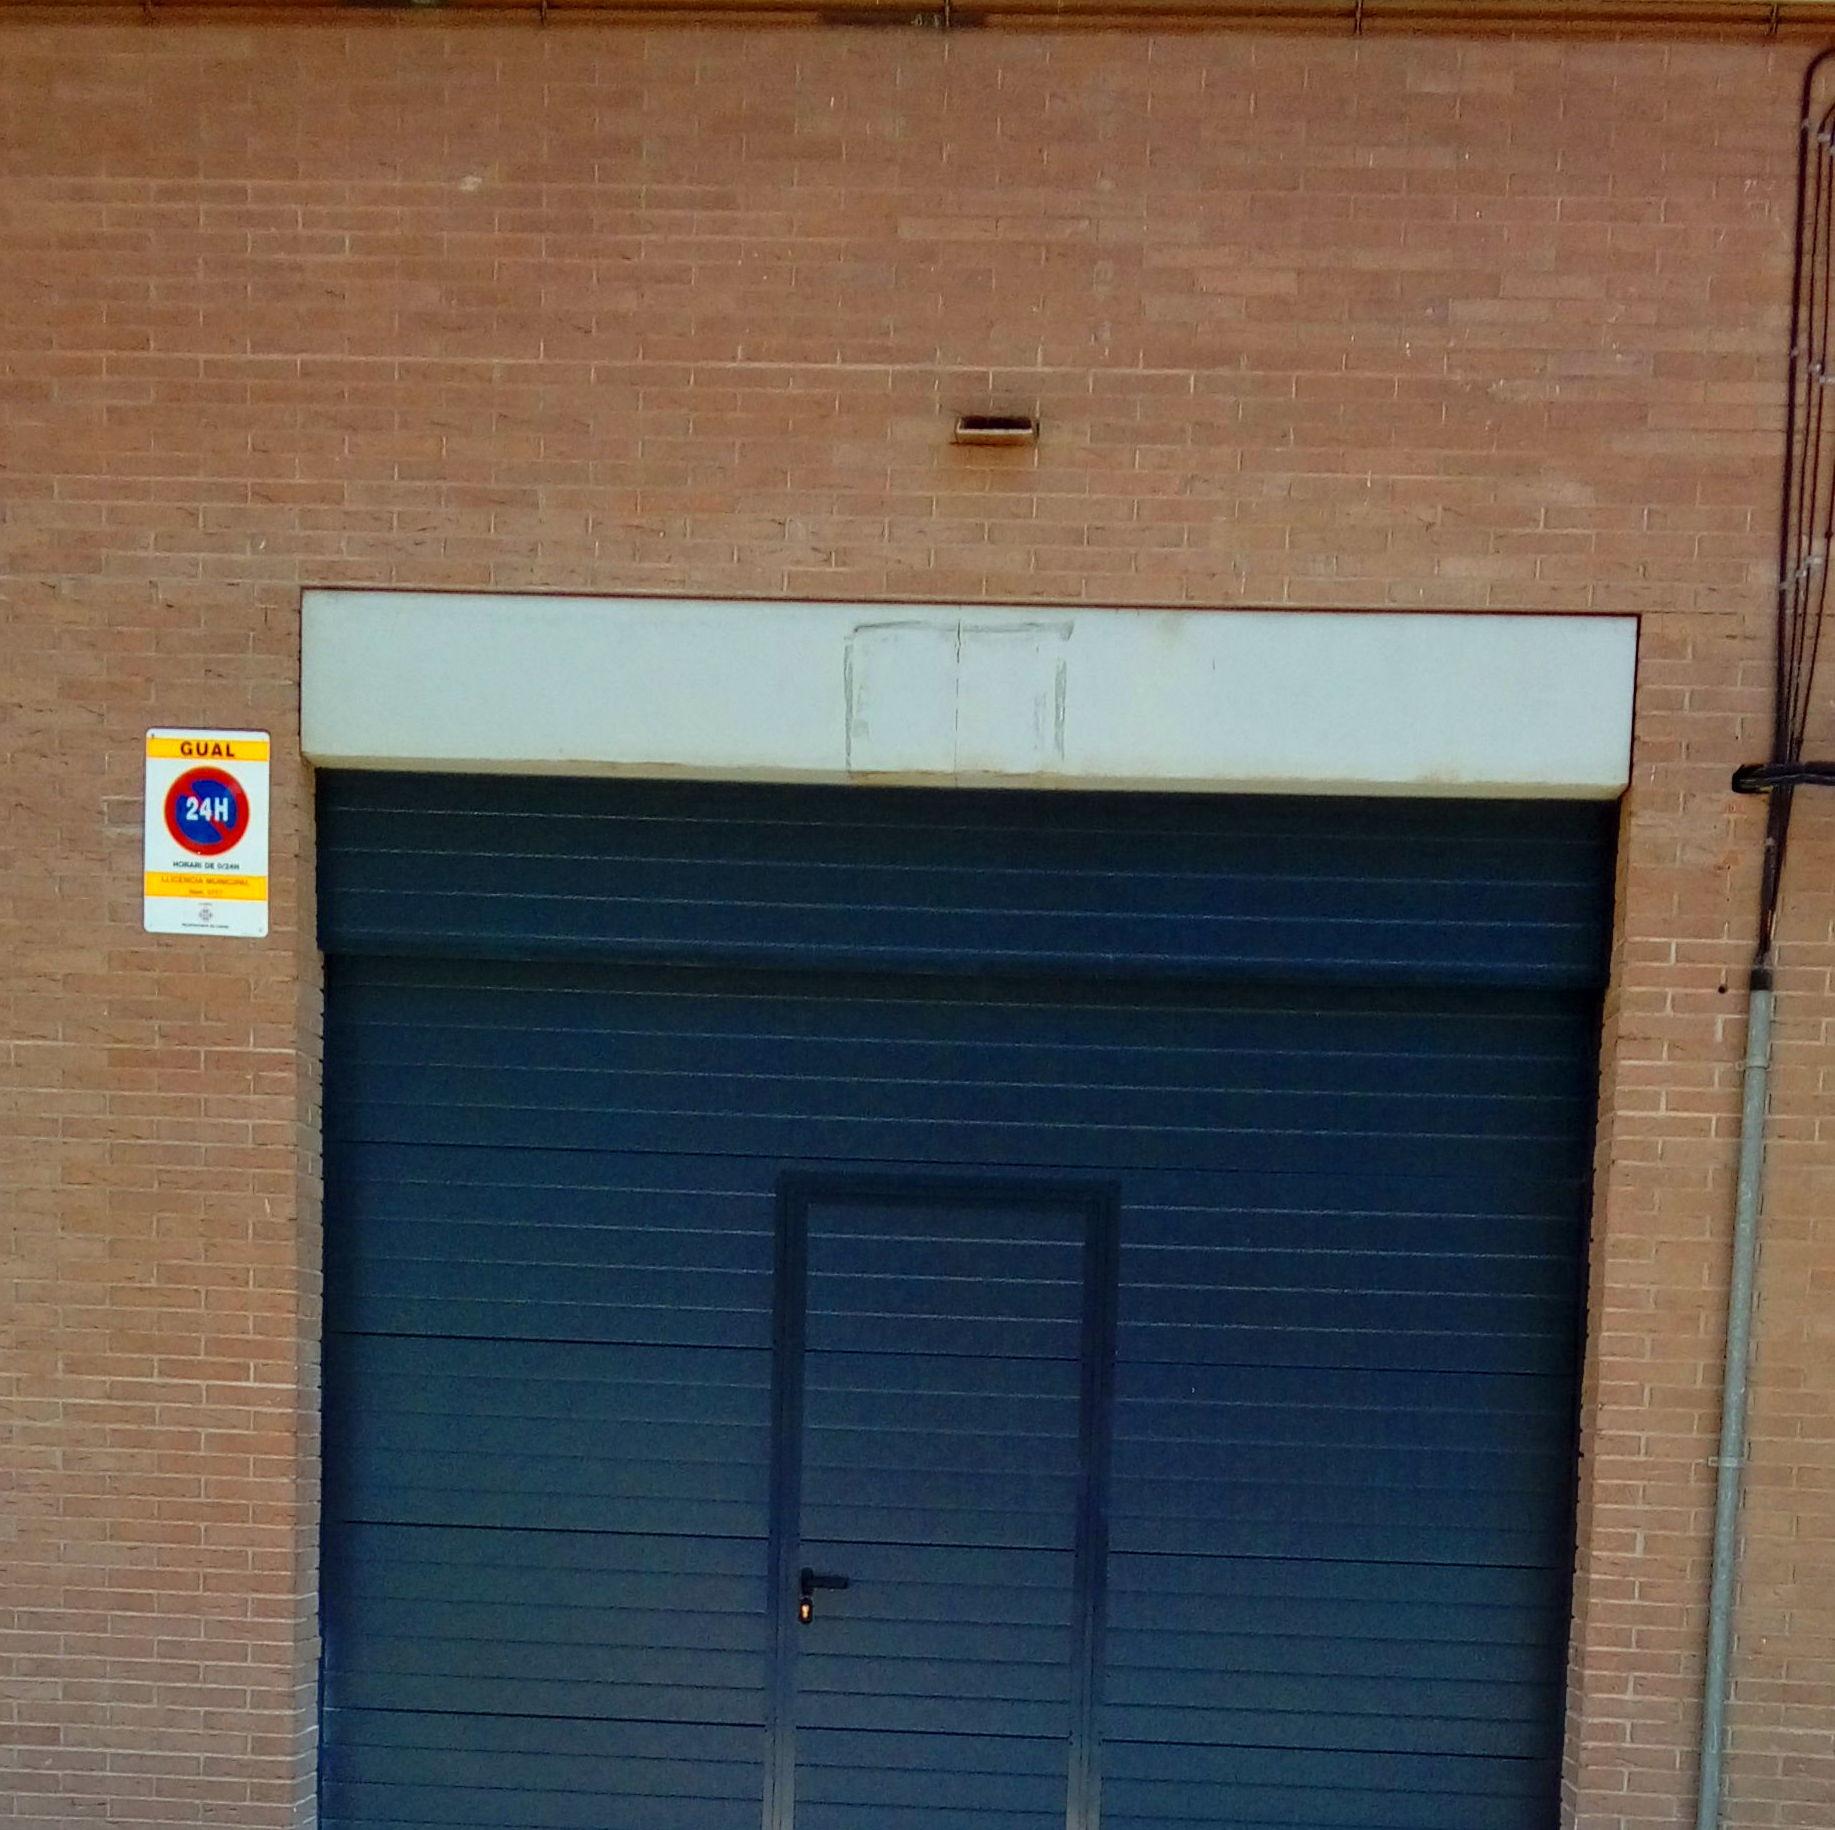 puerta seccional con peatonal